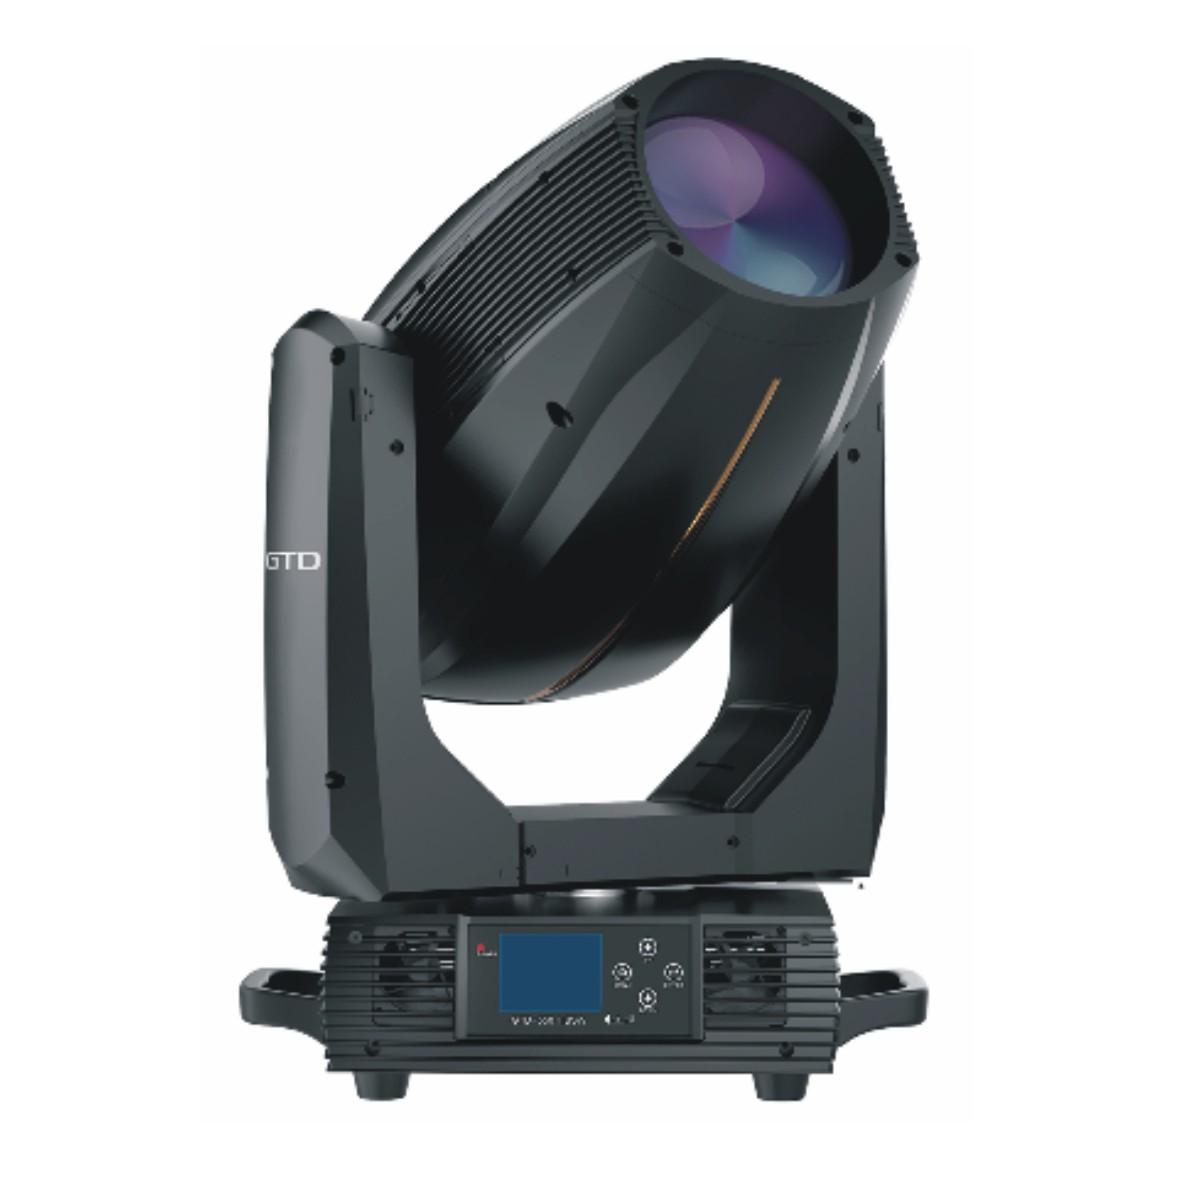 GTD-550 II BSW 电脑摇头灯(三合一)